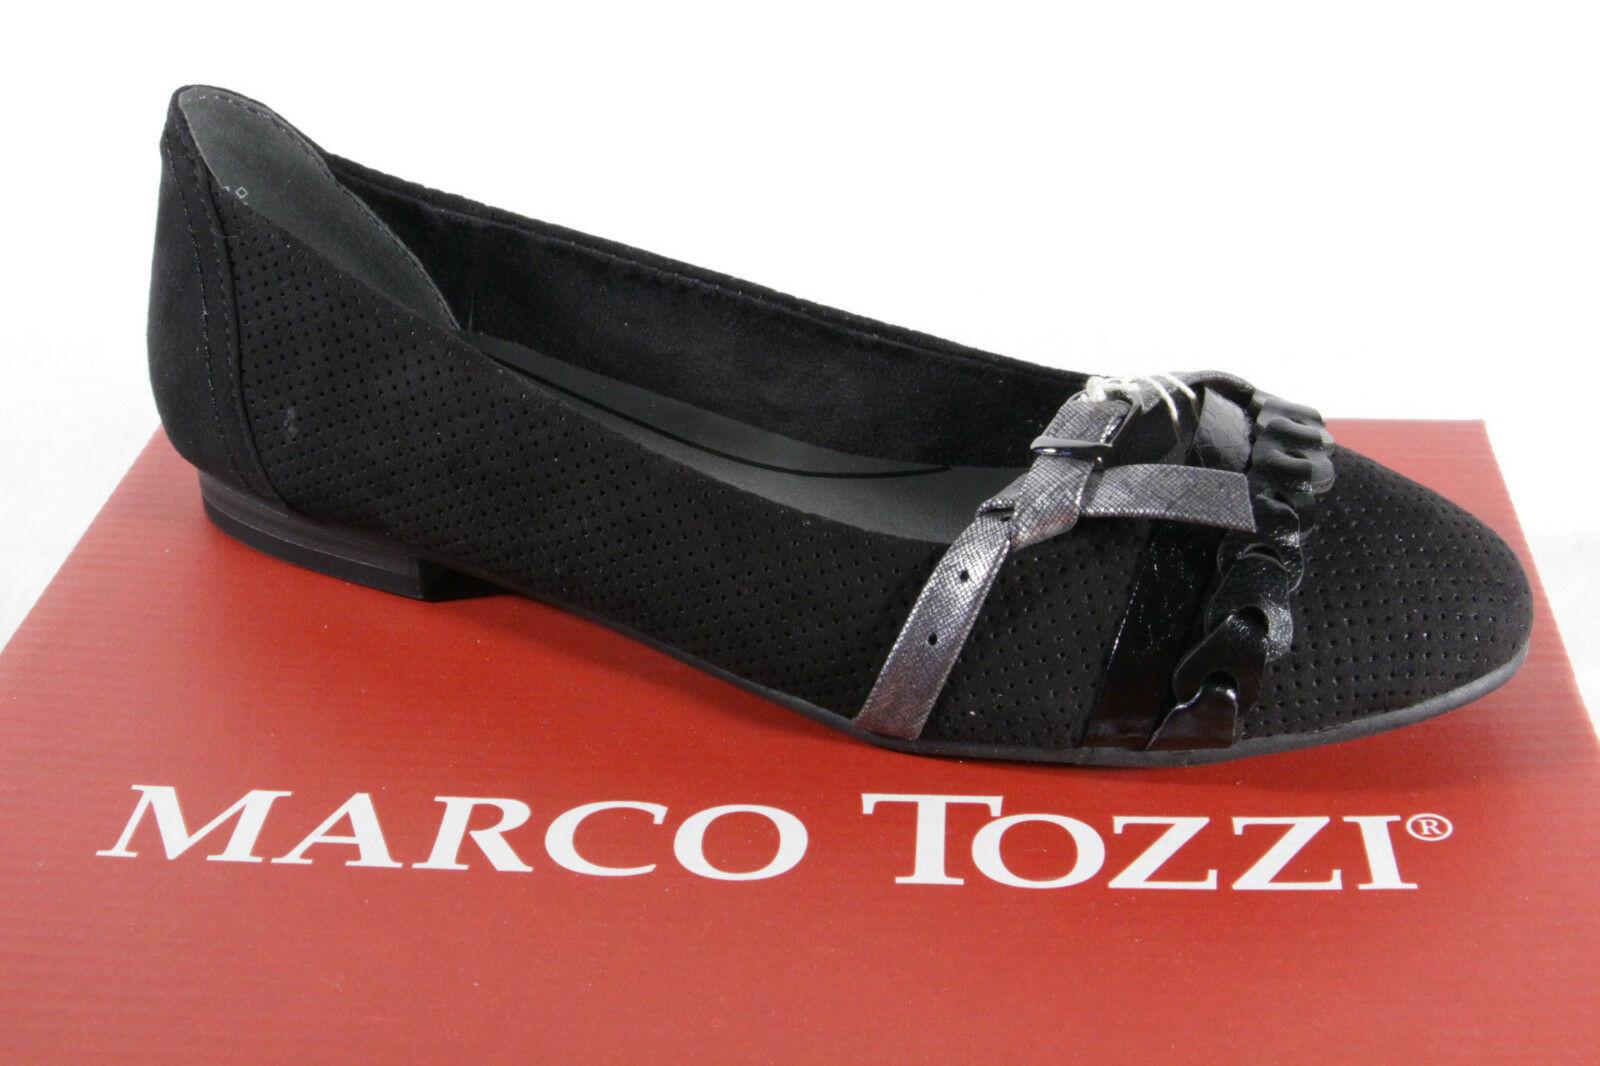 Gr Slipper MARCO TOZZI Ballerinas Damenschuhe schwarz Neu 38